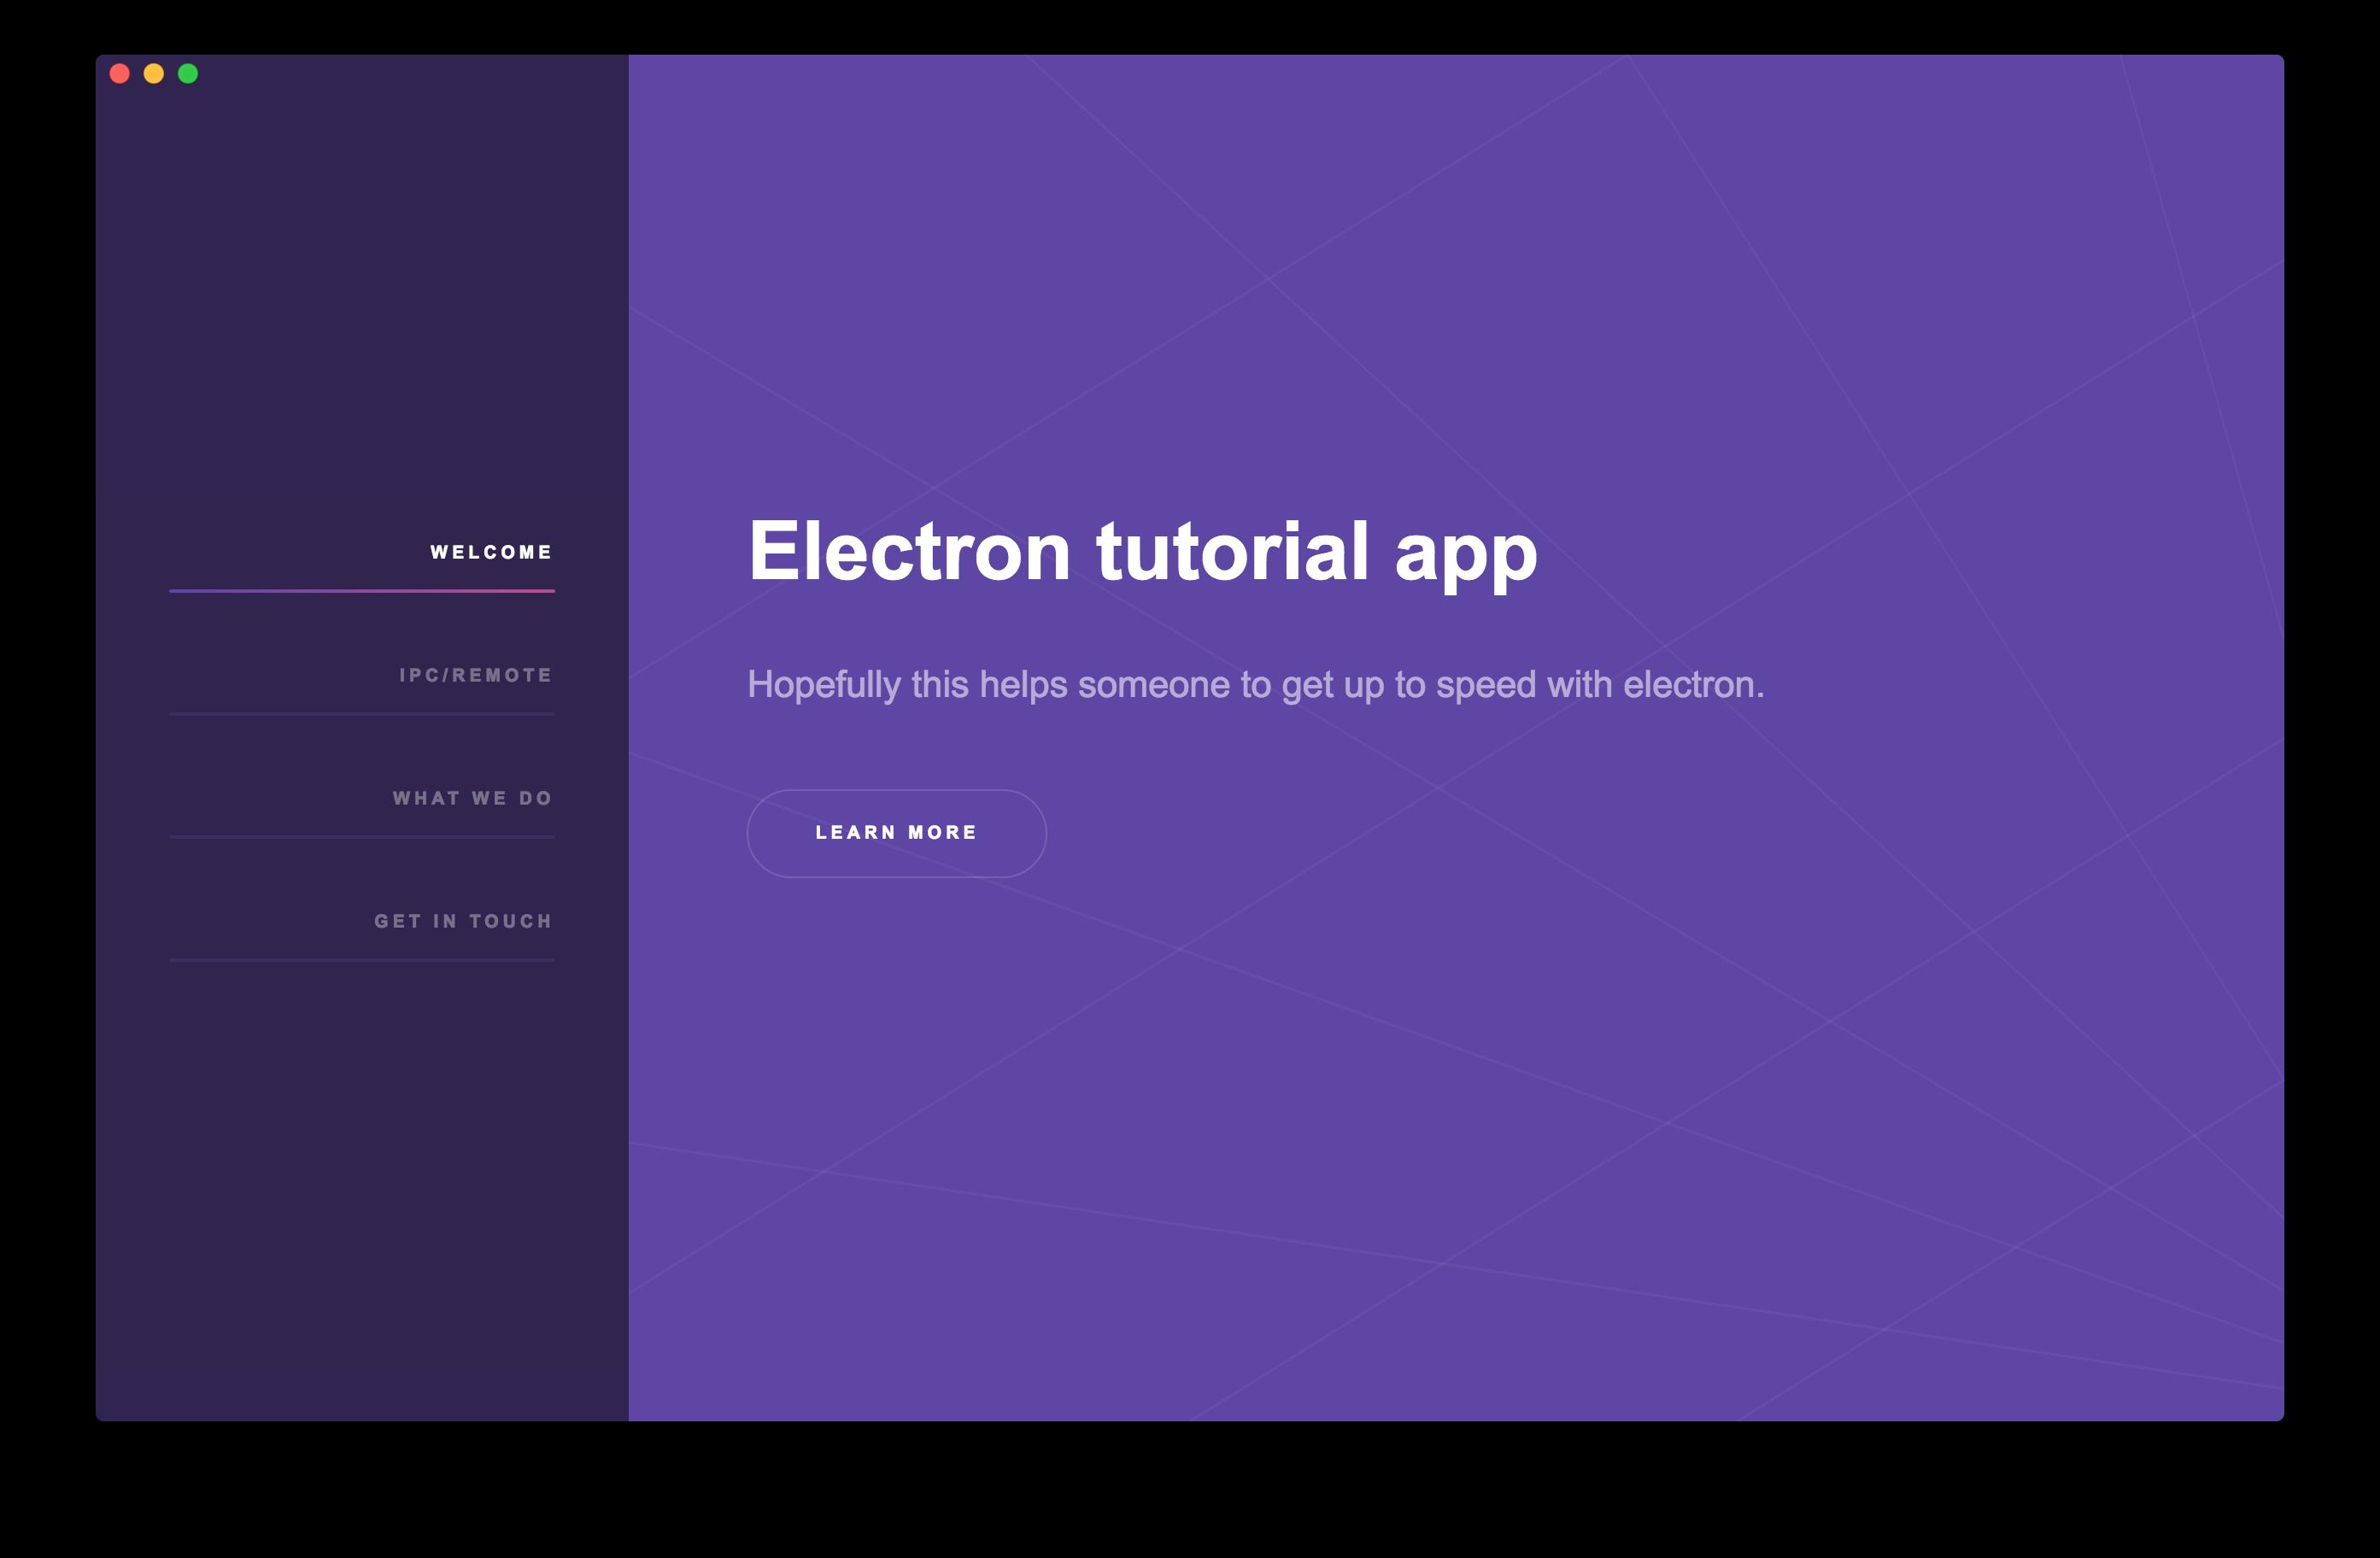 Electron tutorial app